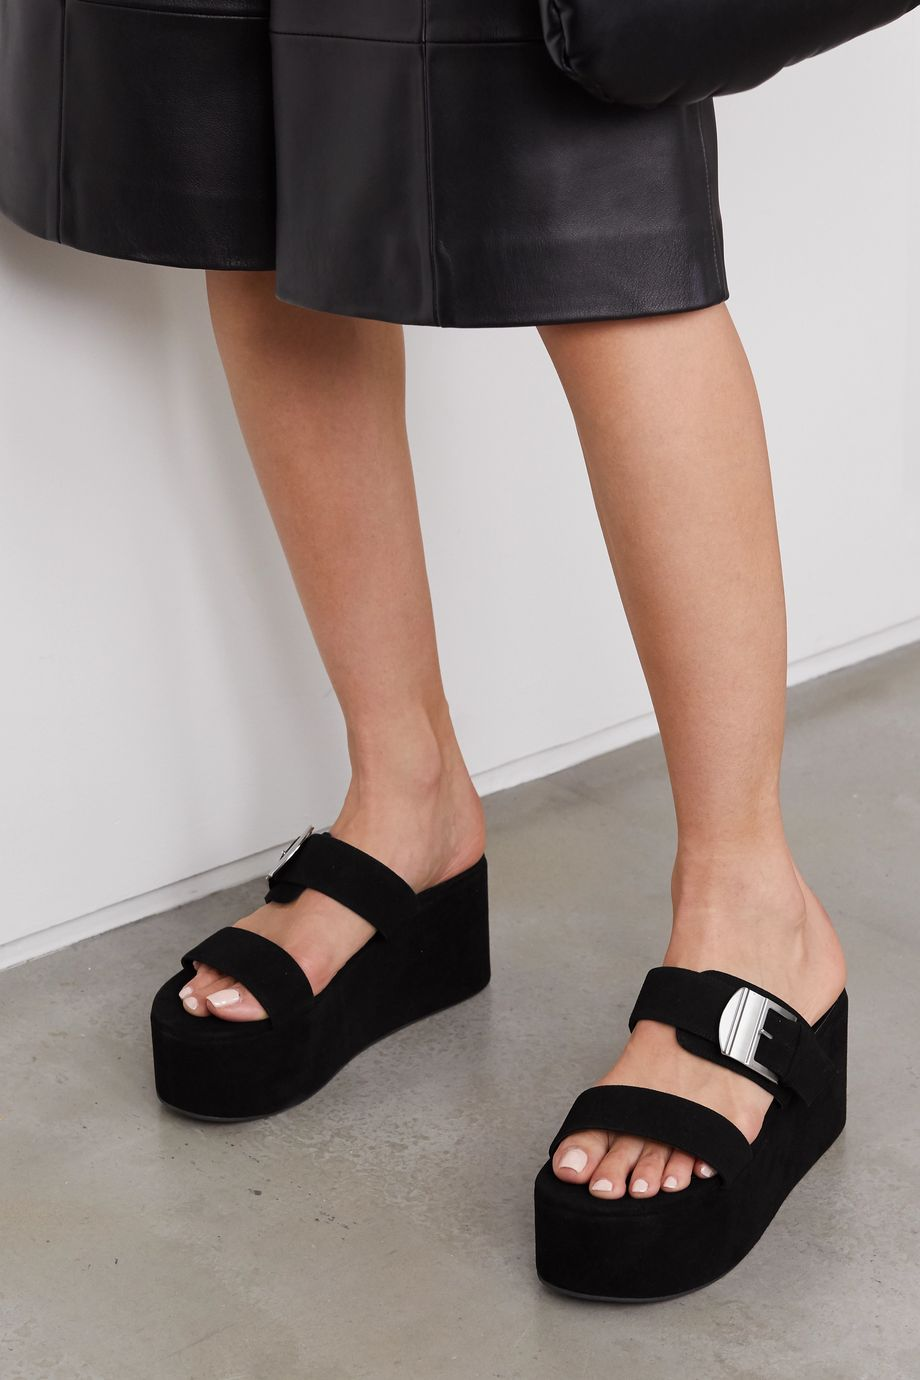 SIMON MILLER Pantoletten aus Leder mit Plateau und Schnalle